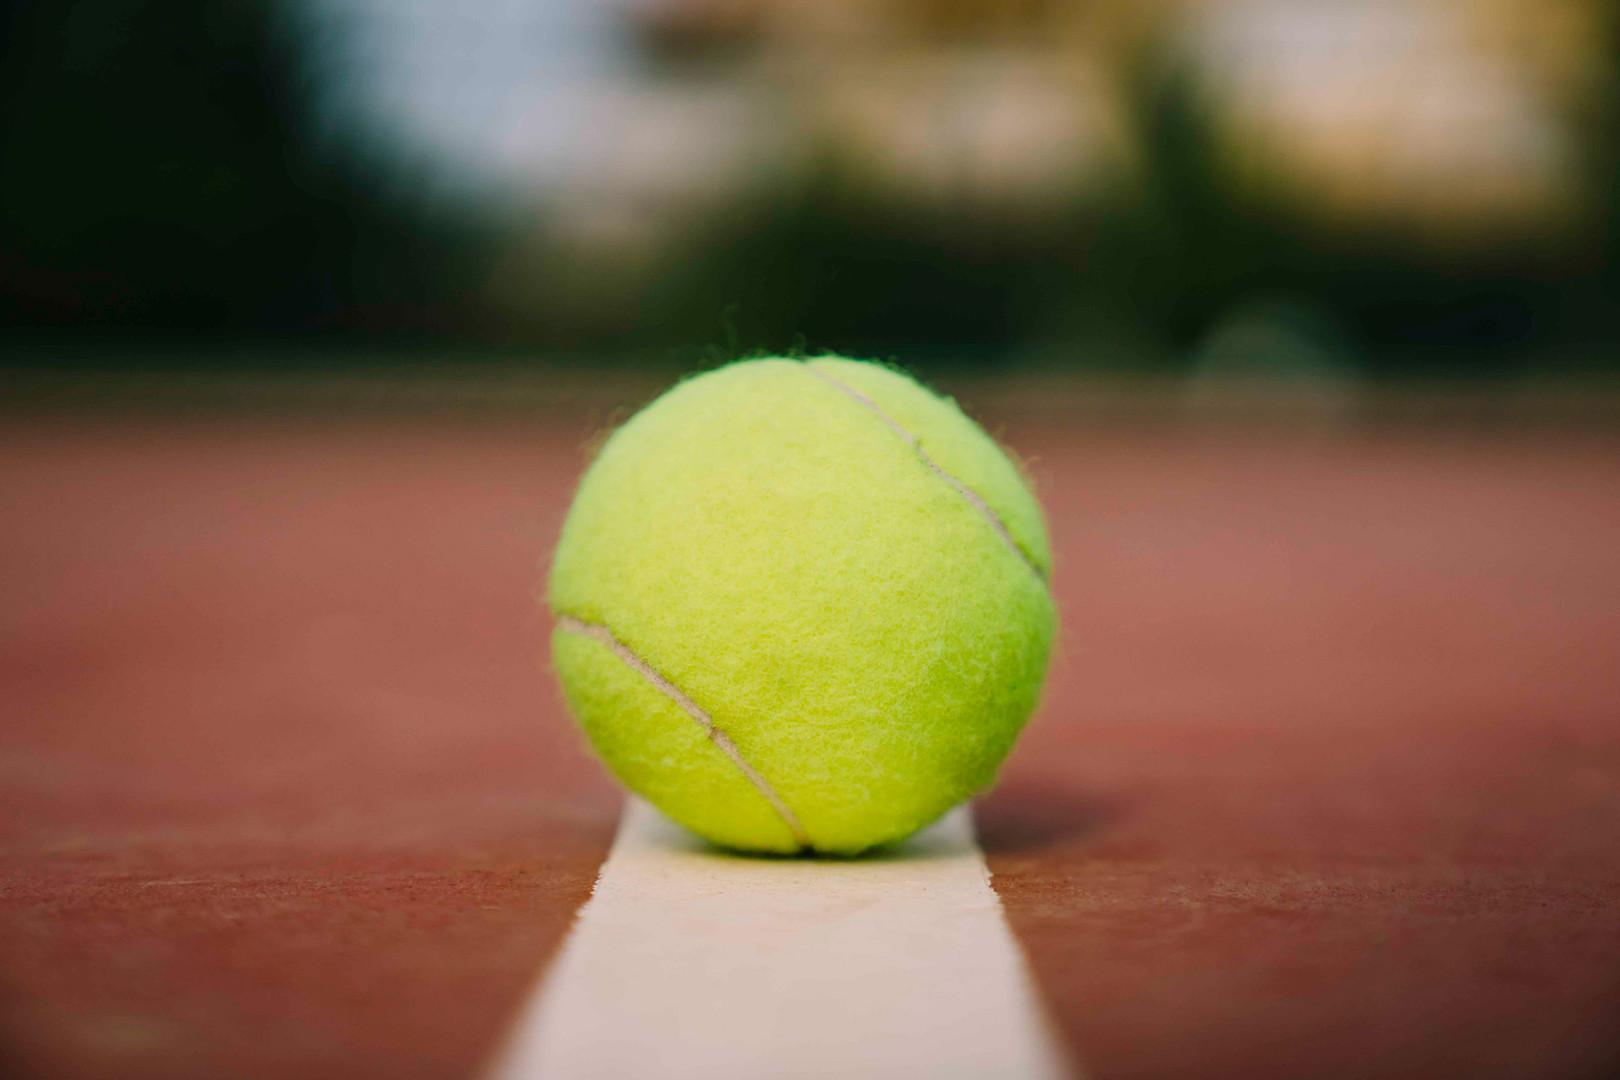 vv-lauko-tenisas-cover-2.jpg